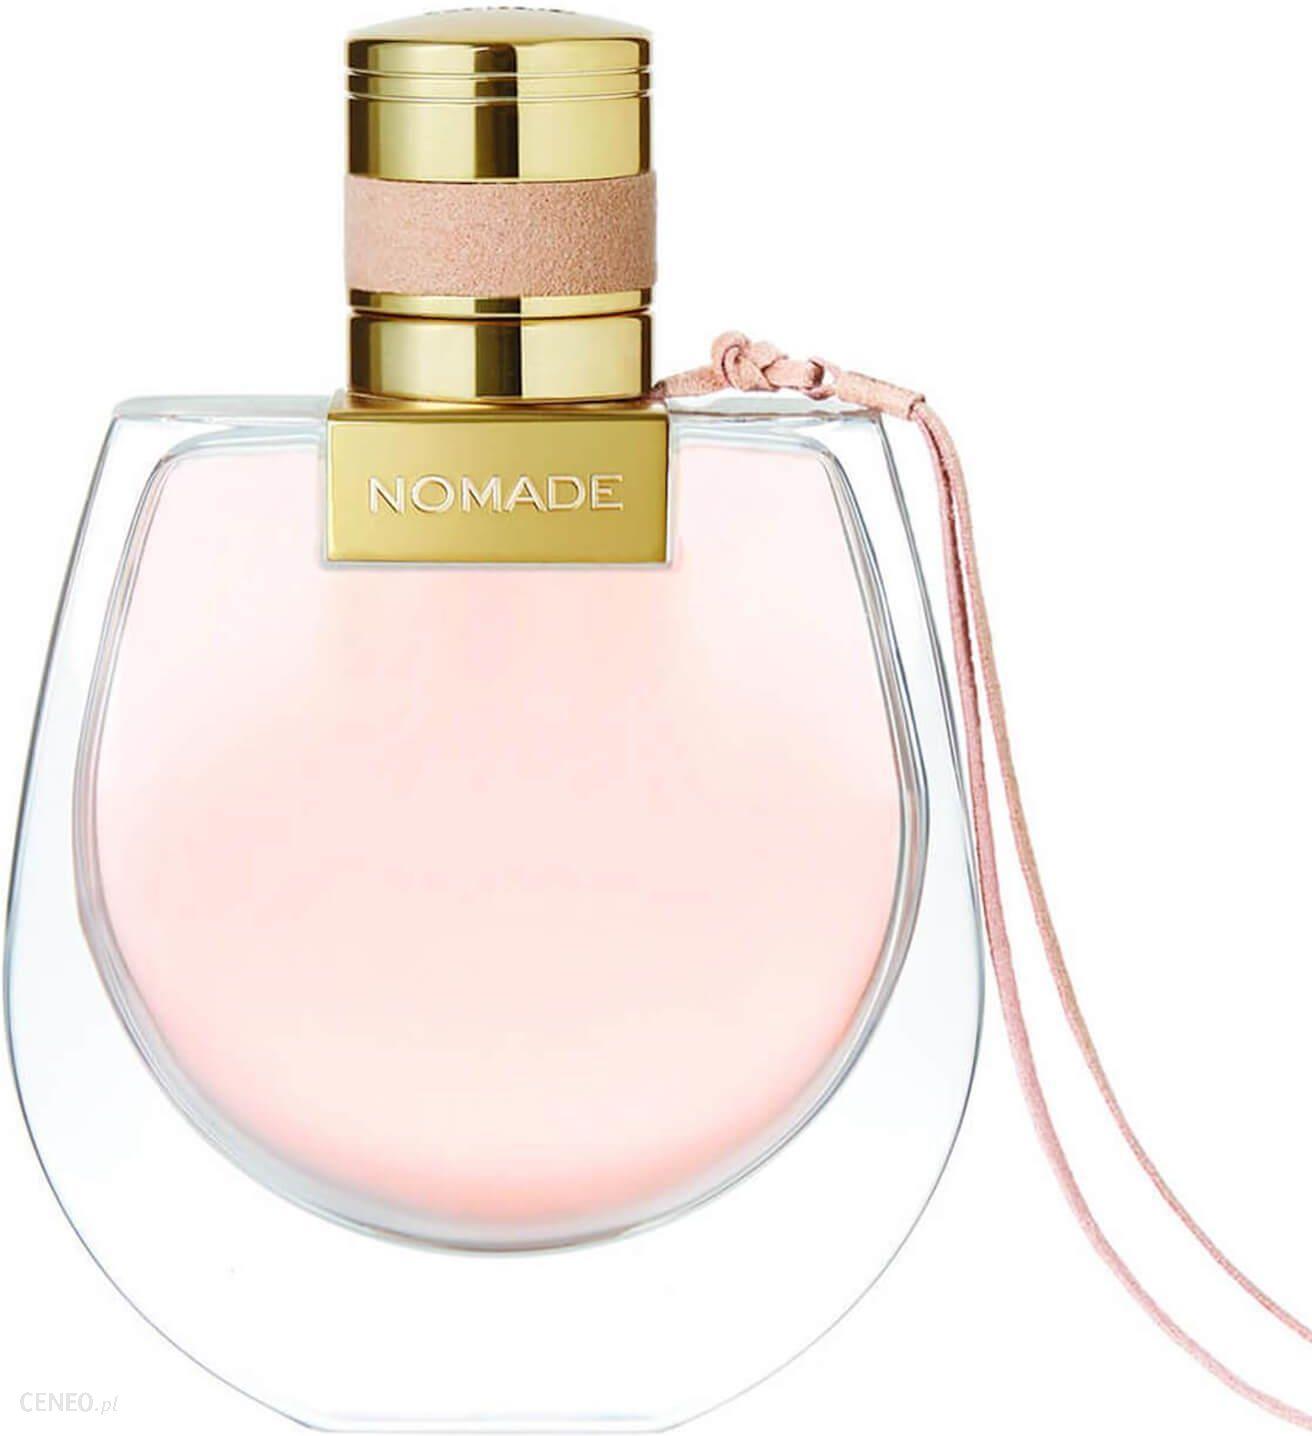 Chloe Nomade woda perfumowana 75ml